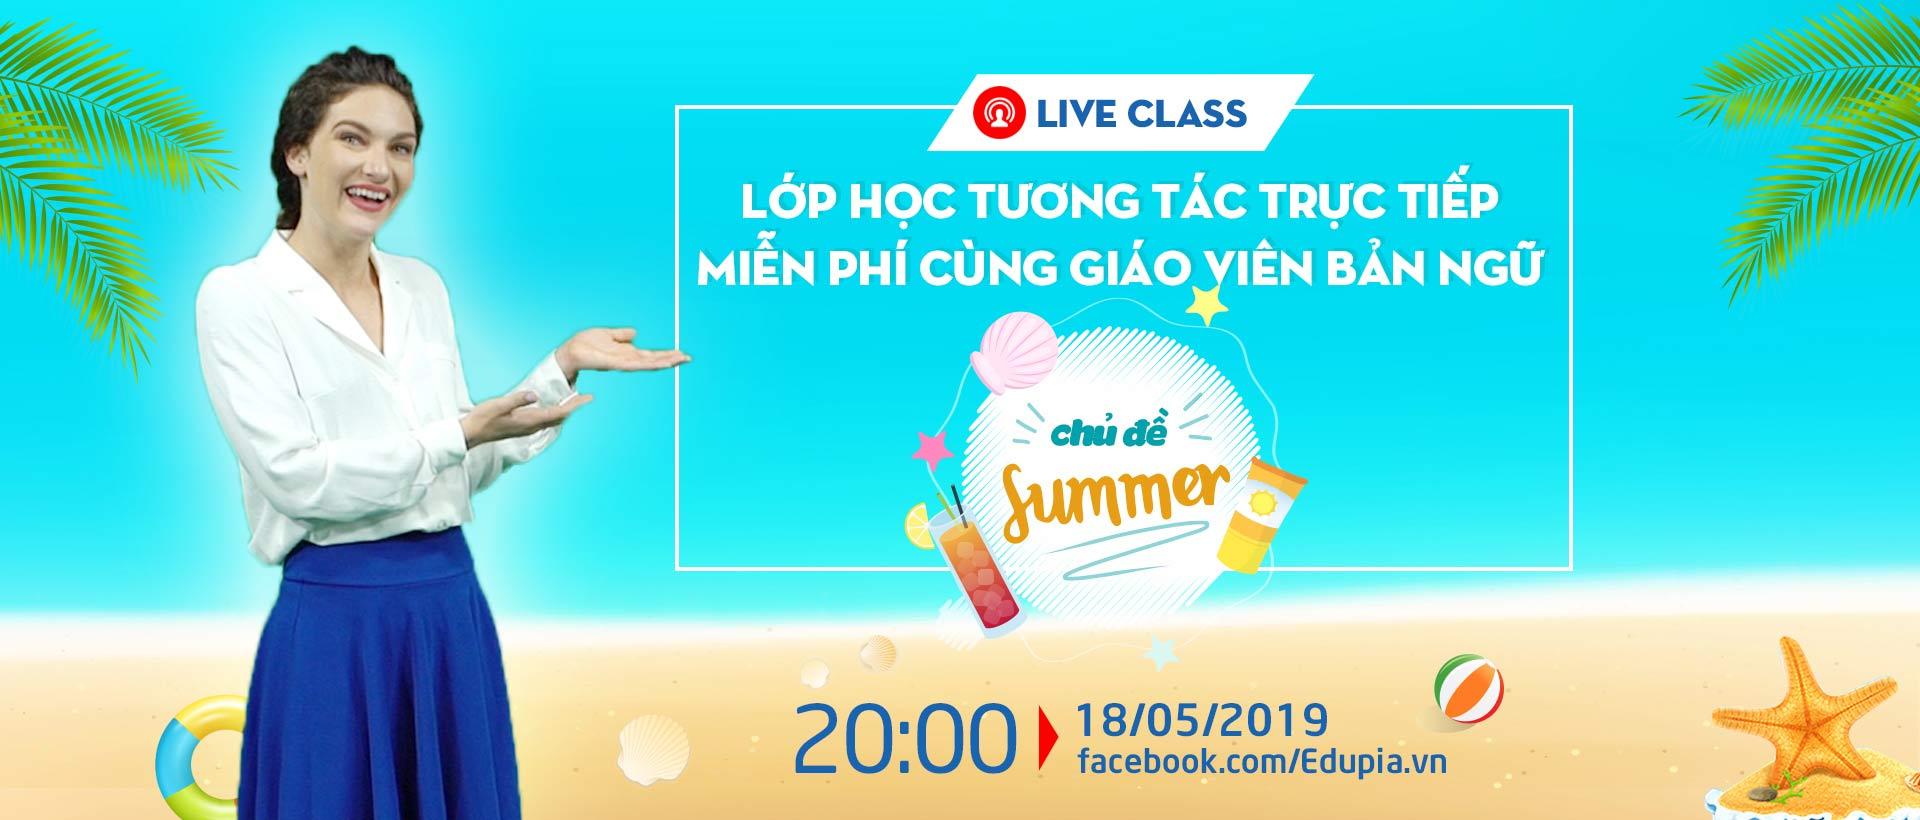 Live class tuần 4 - CHỦ ĐỀ: SUMMER